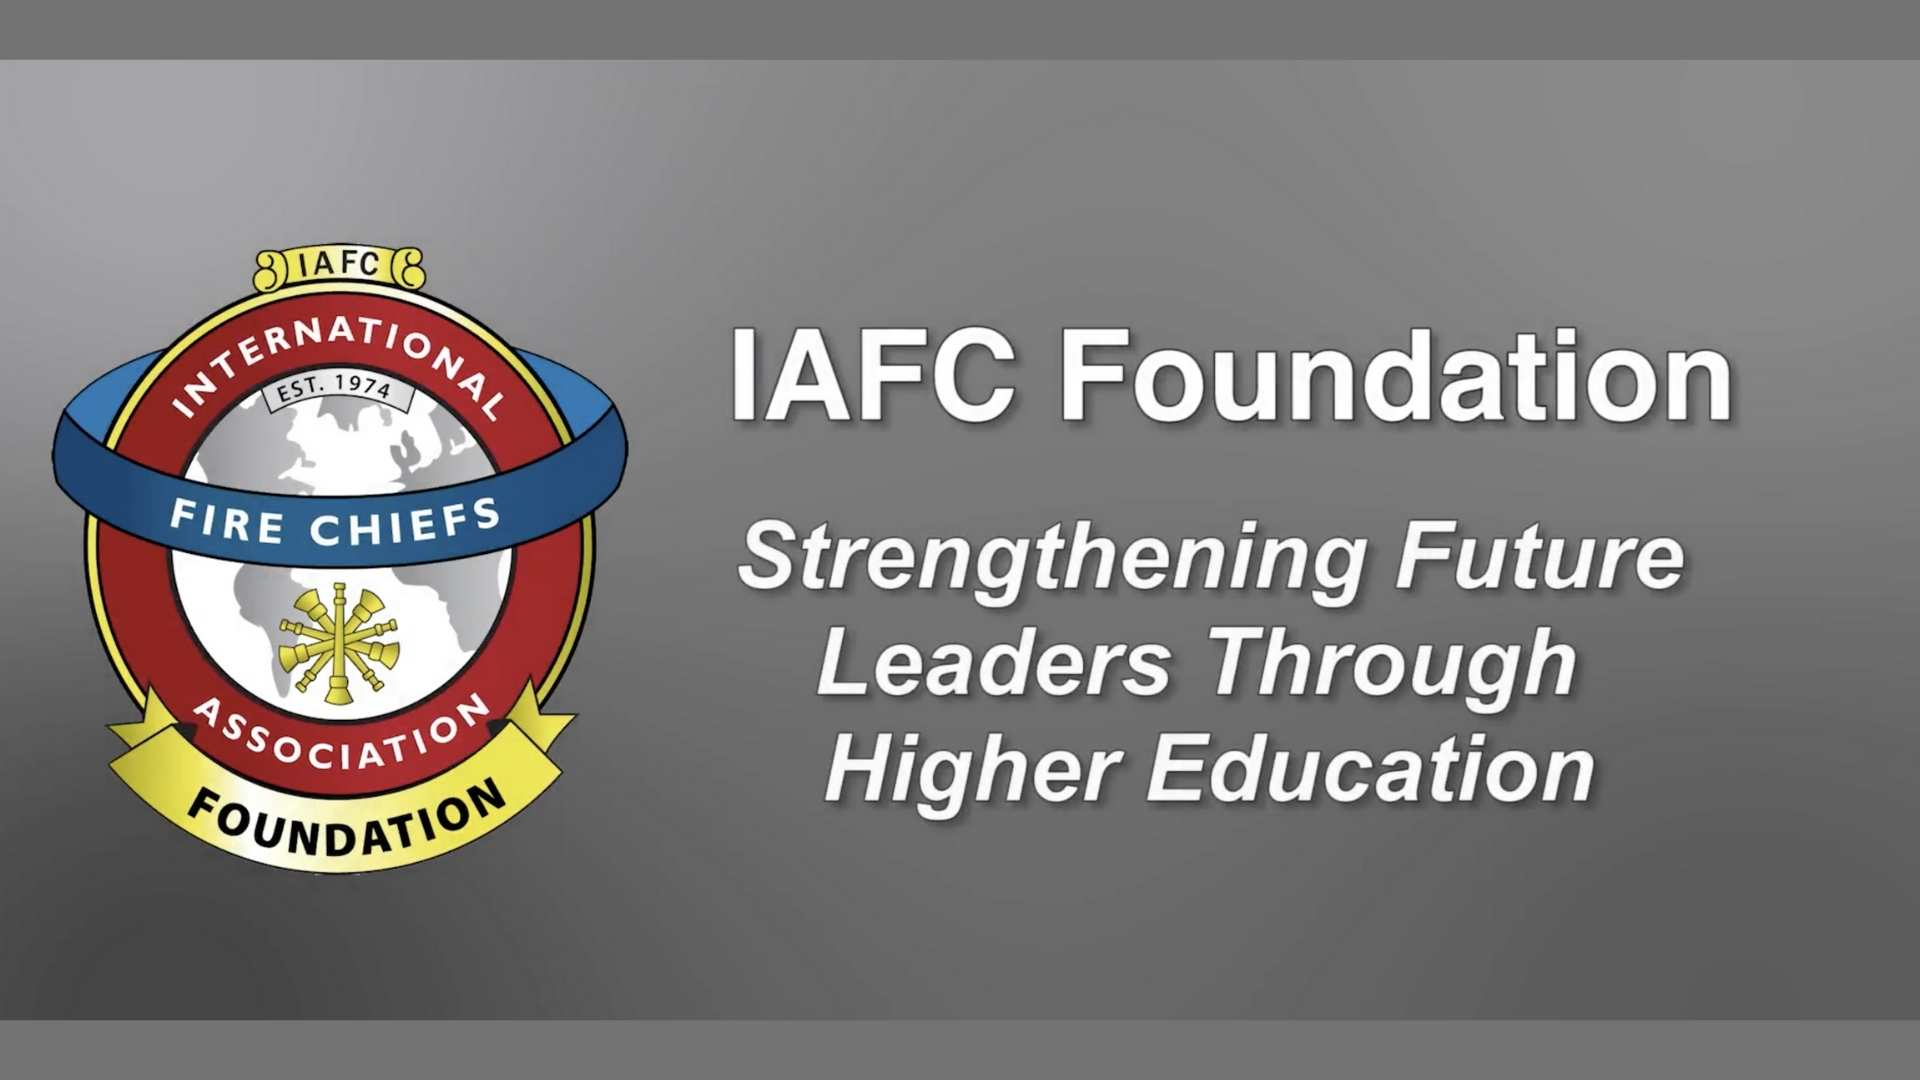 IAFCF EXPLORERS